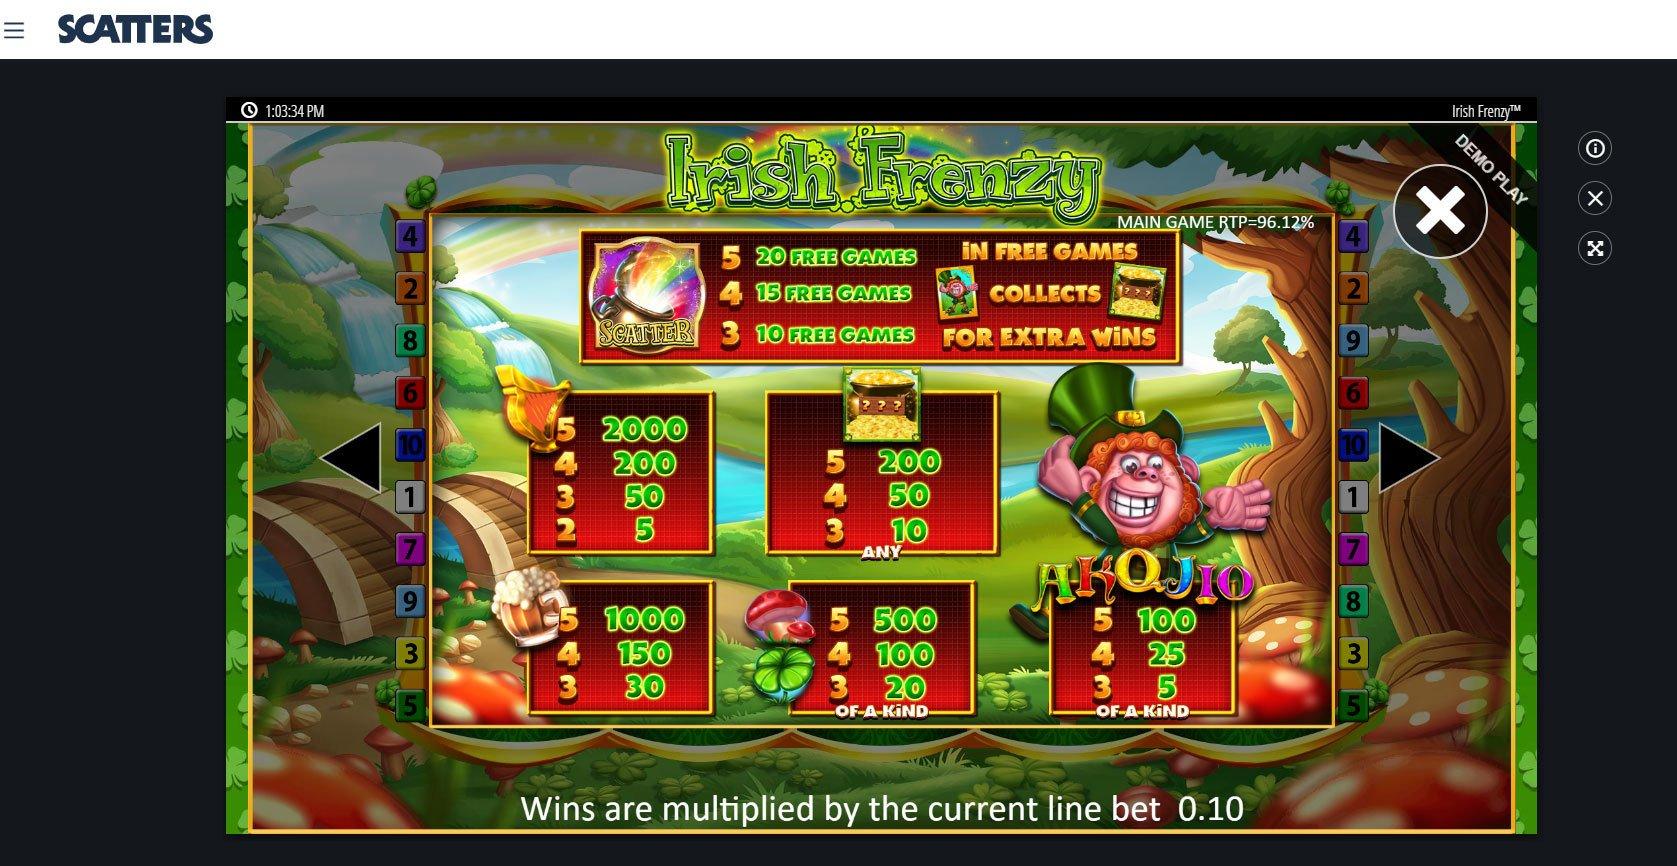 Irish Frenzy Online Slot - Scatters Online Casino